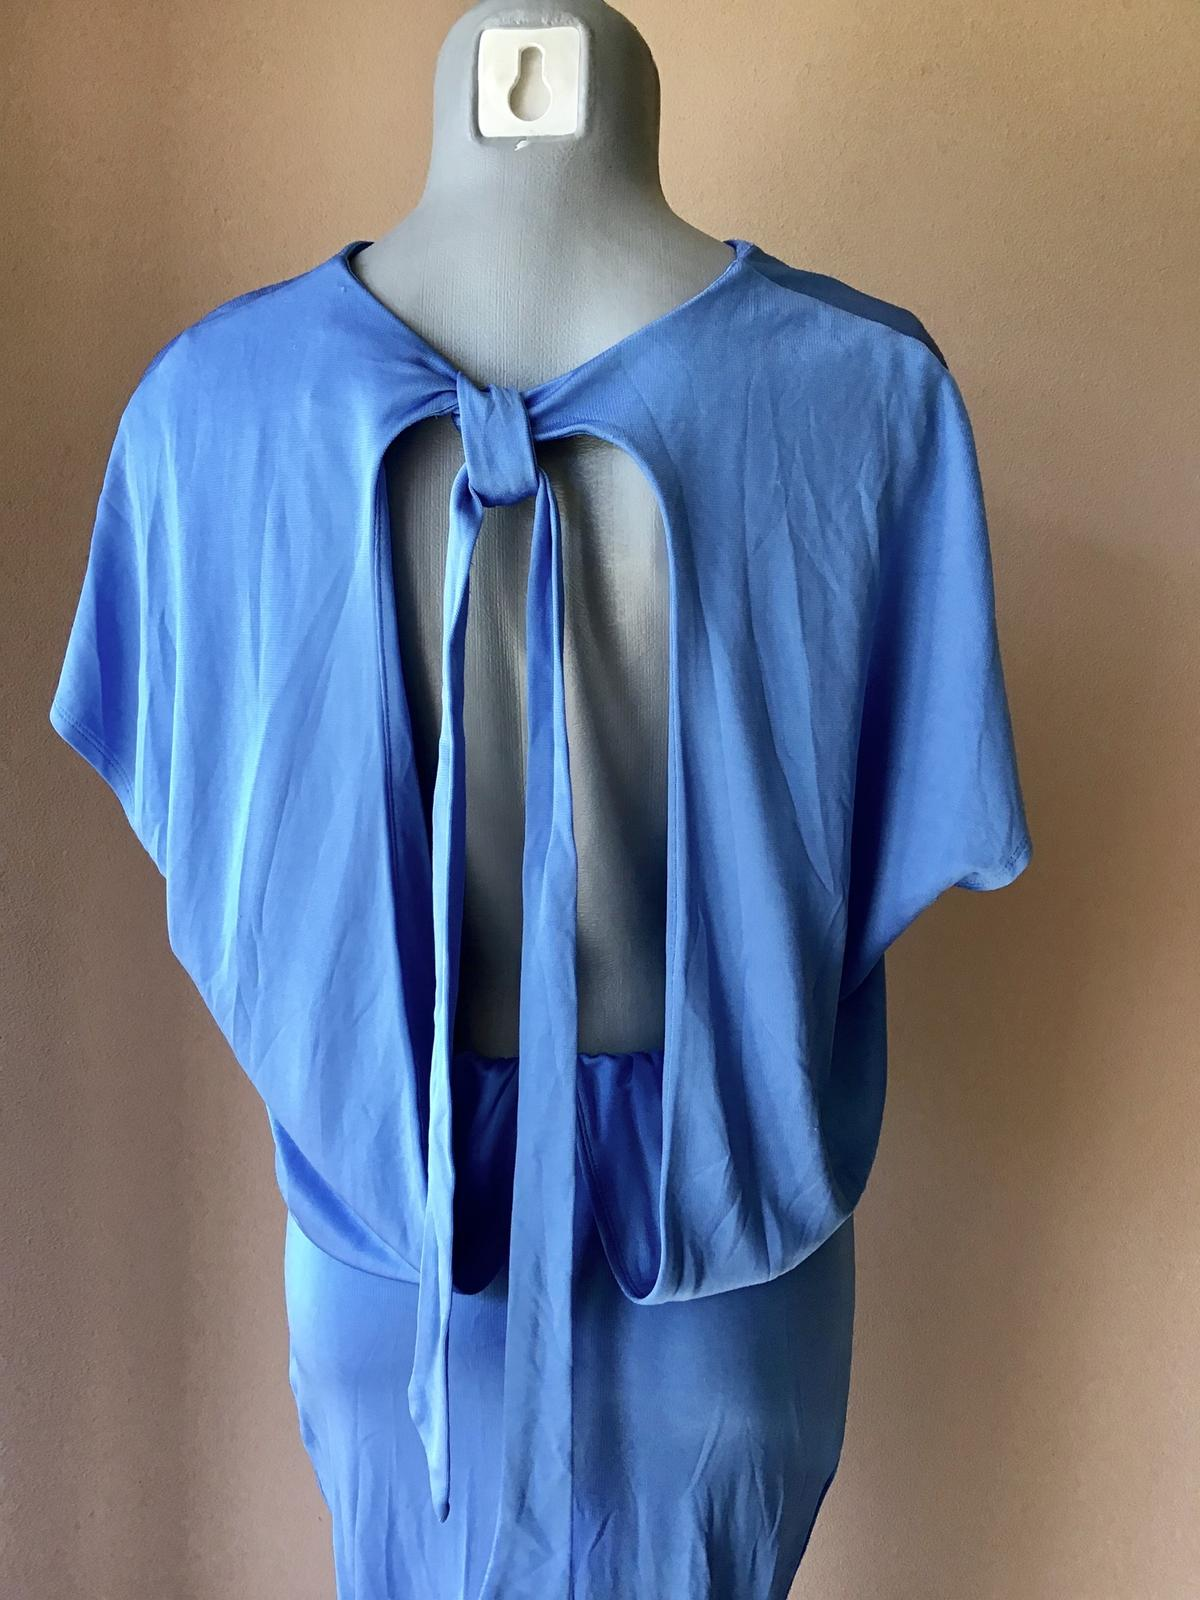 Šaty h&m - Obrázok č. 3